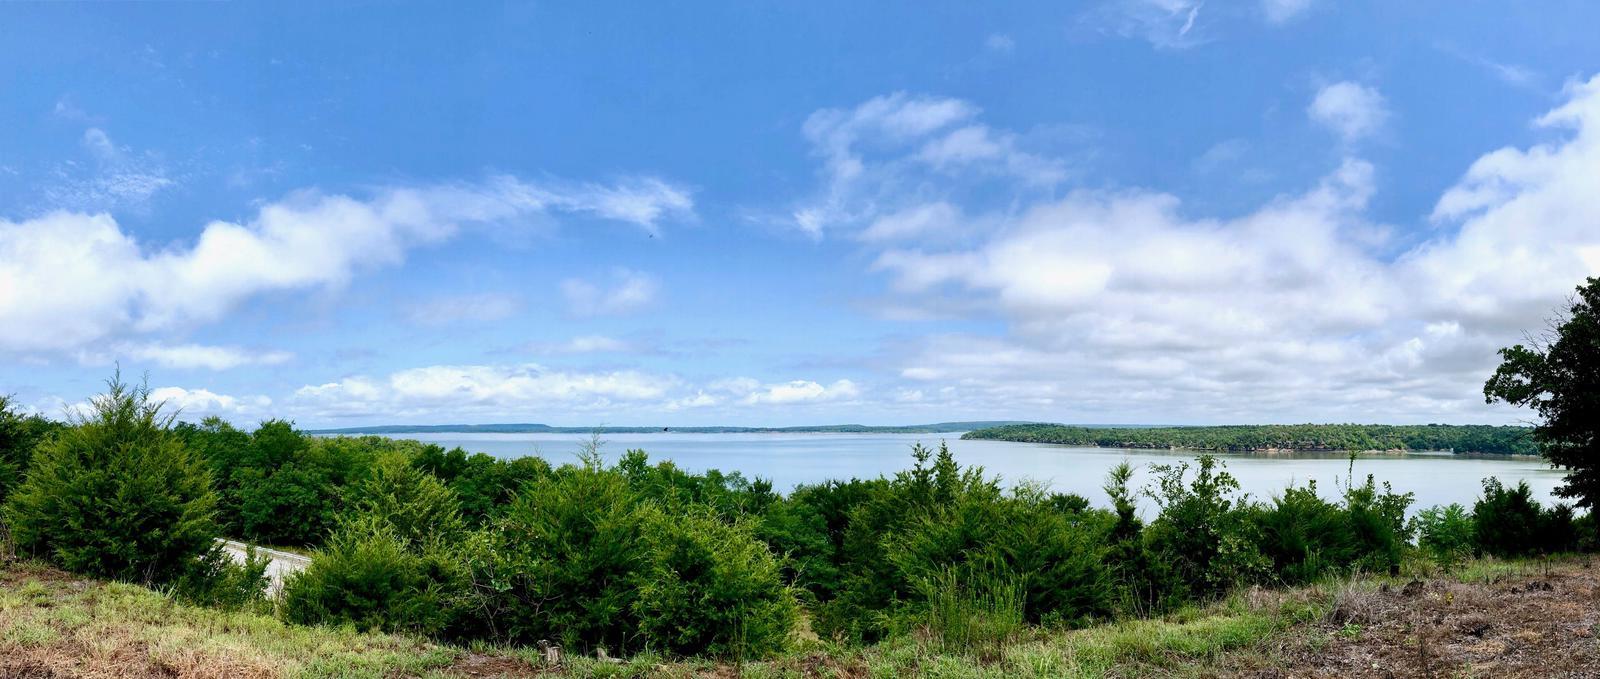 Preview photo of Eufaula Lake